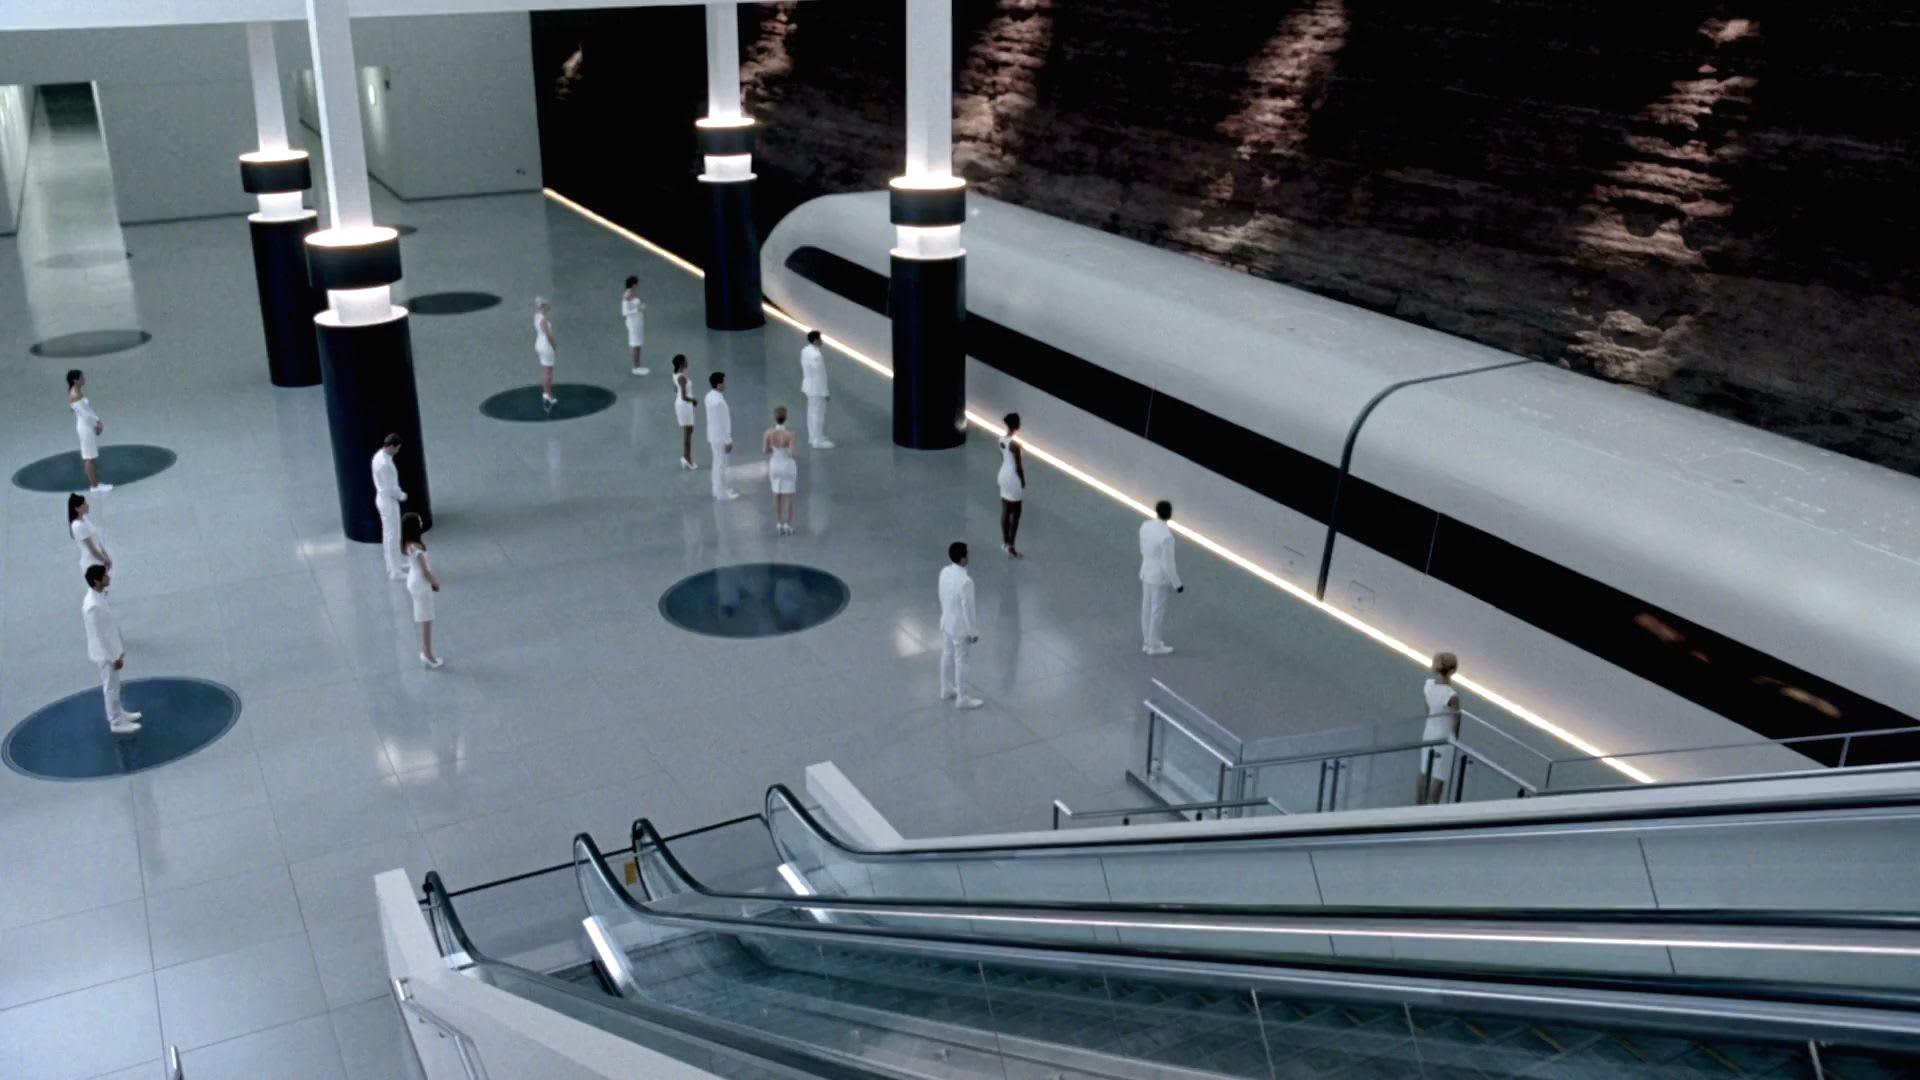 Westworld crew on creating Delos